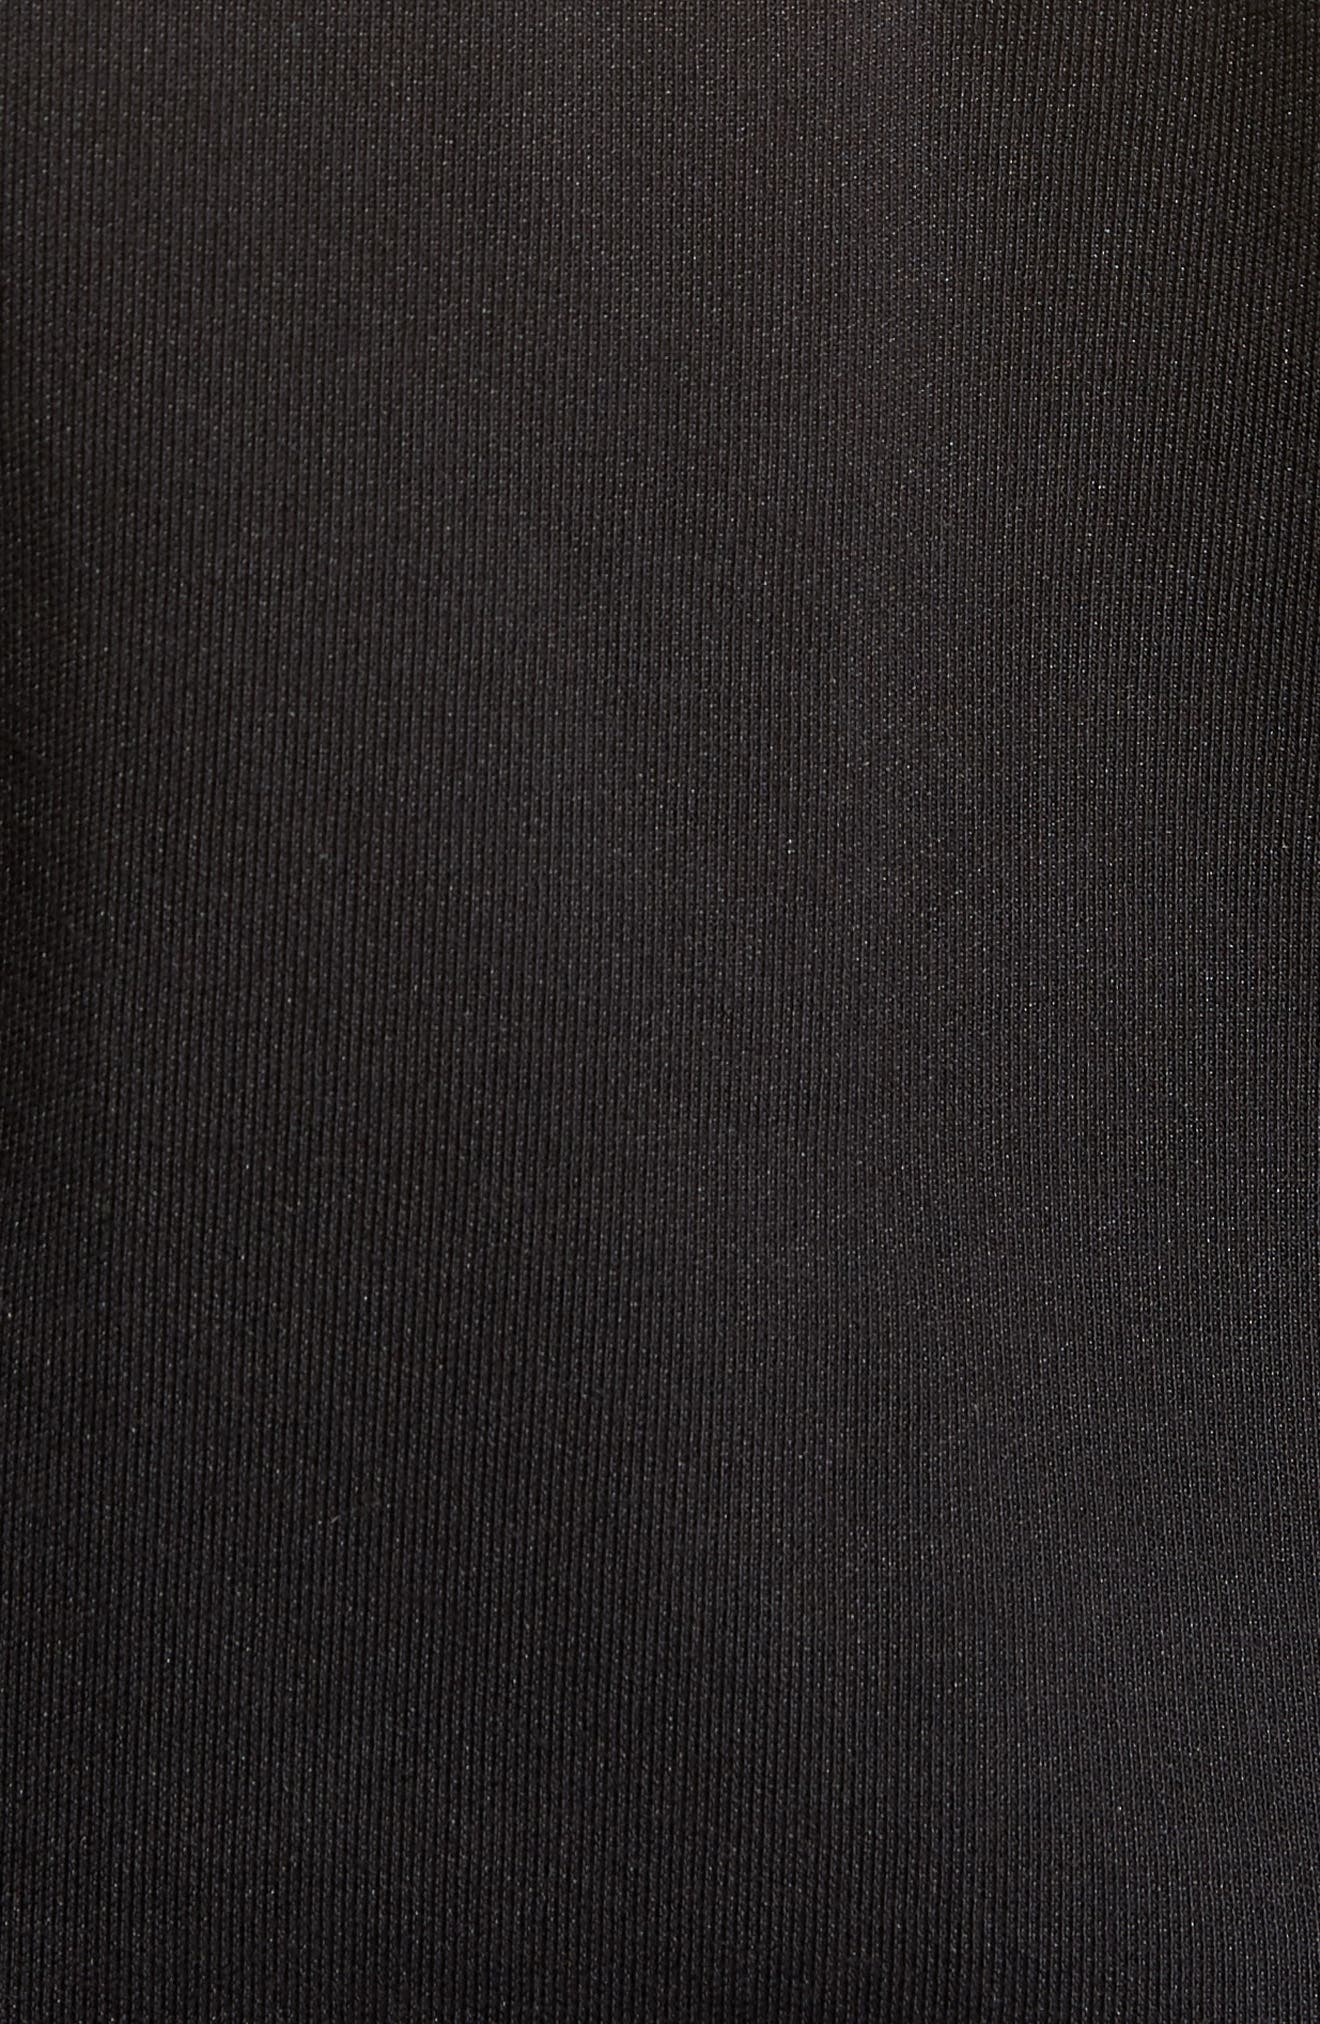 Embroidered Panel Quarter Zip Pullover,                             Alternate thumbnail 5, color,                             Black